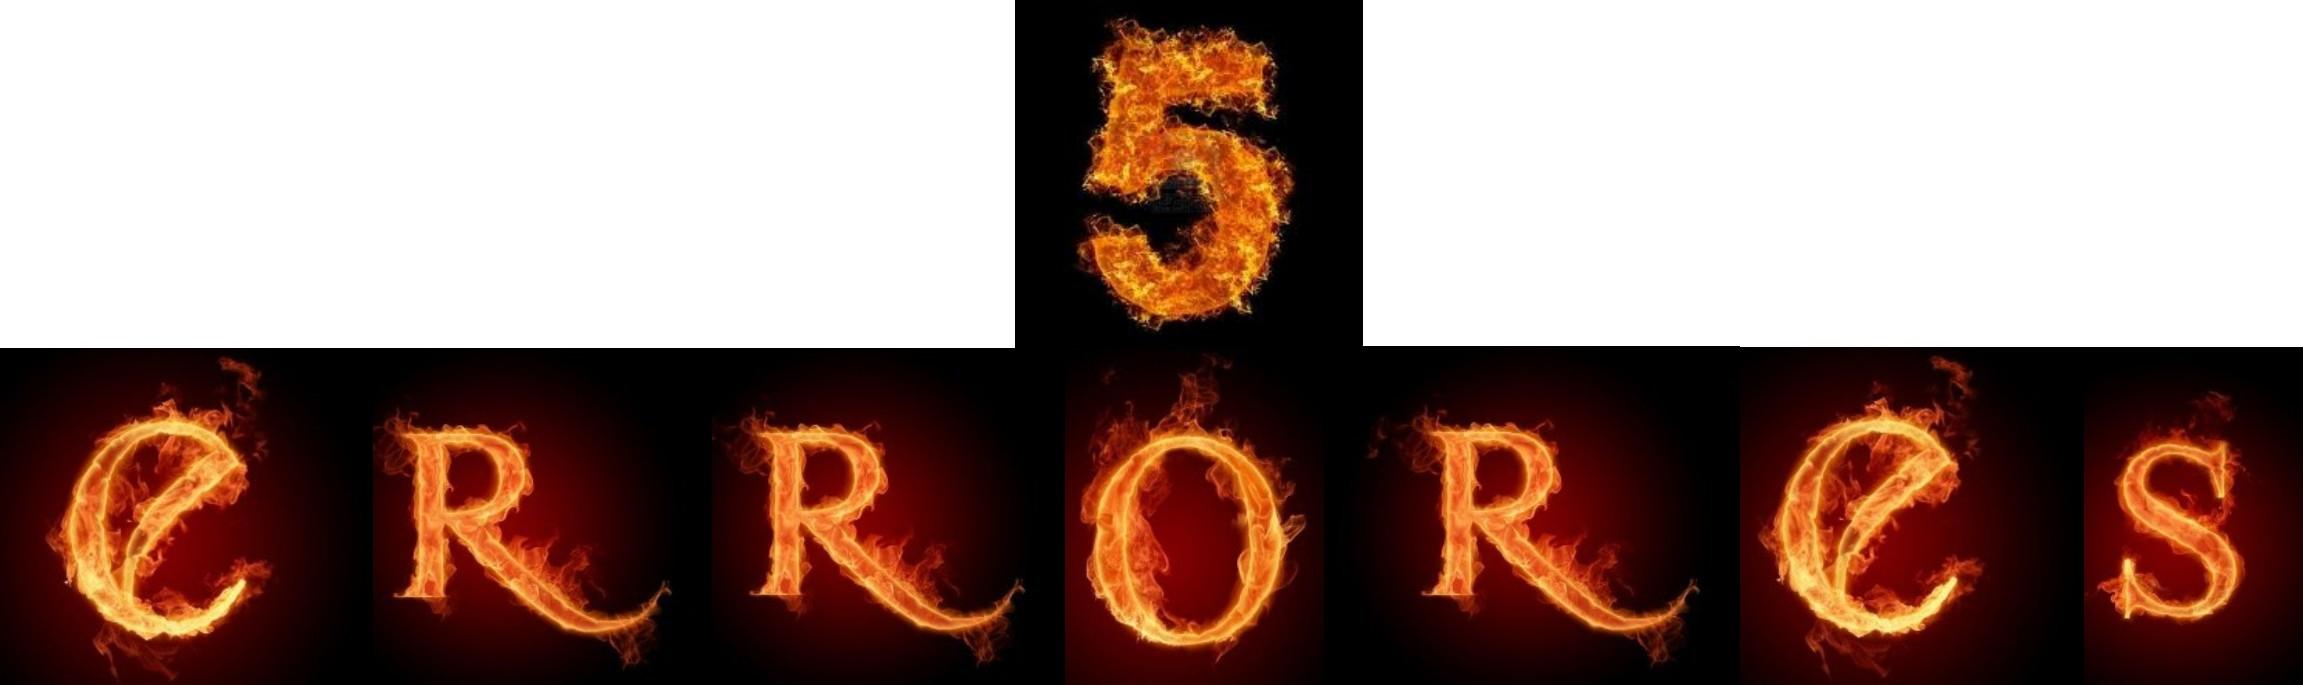 5 ERRORES